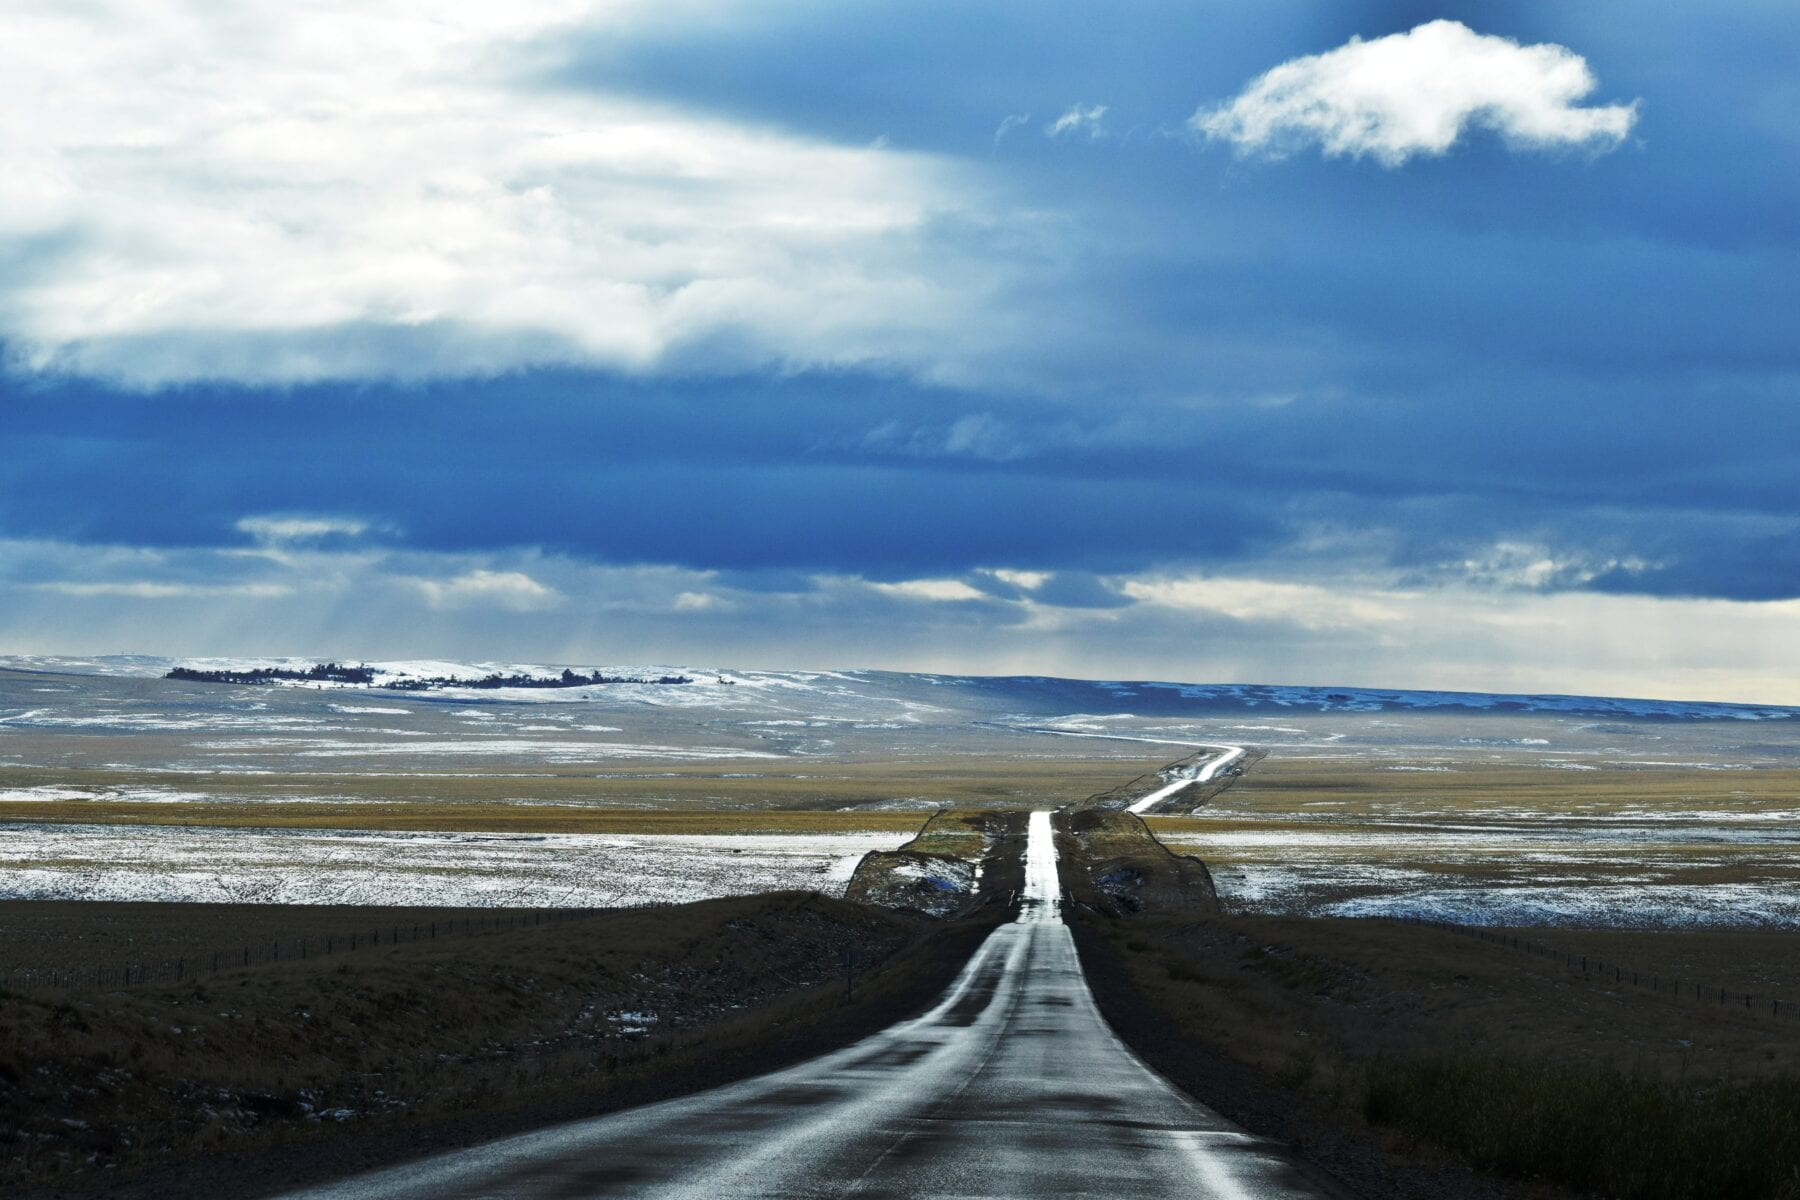 Patagonie weg